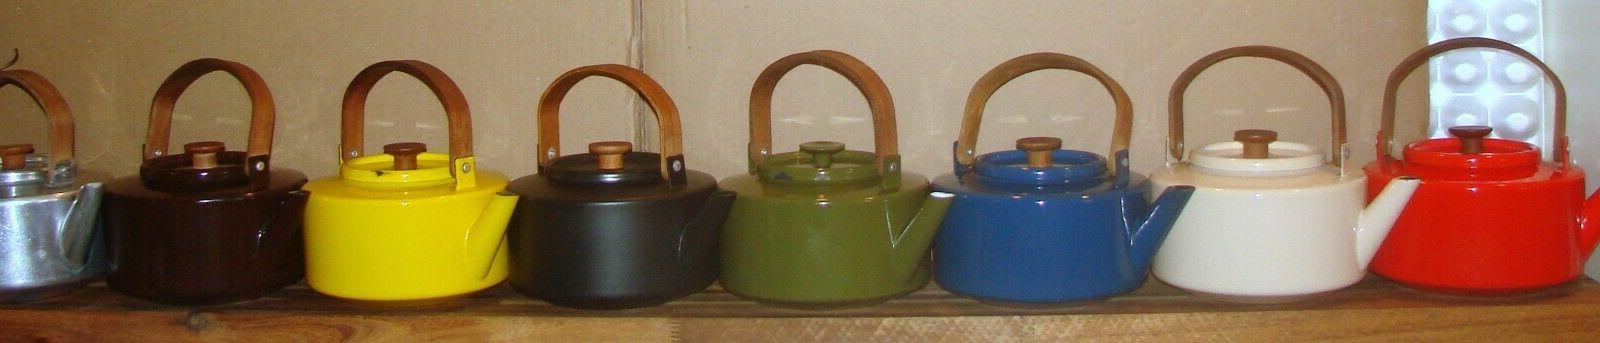 vtg tea kettle mcm michael lax design